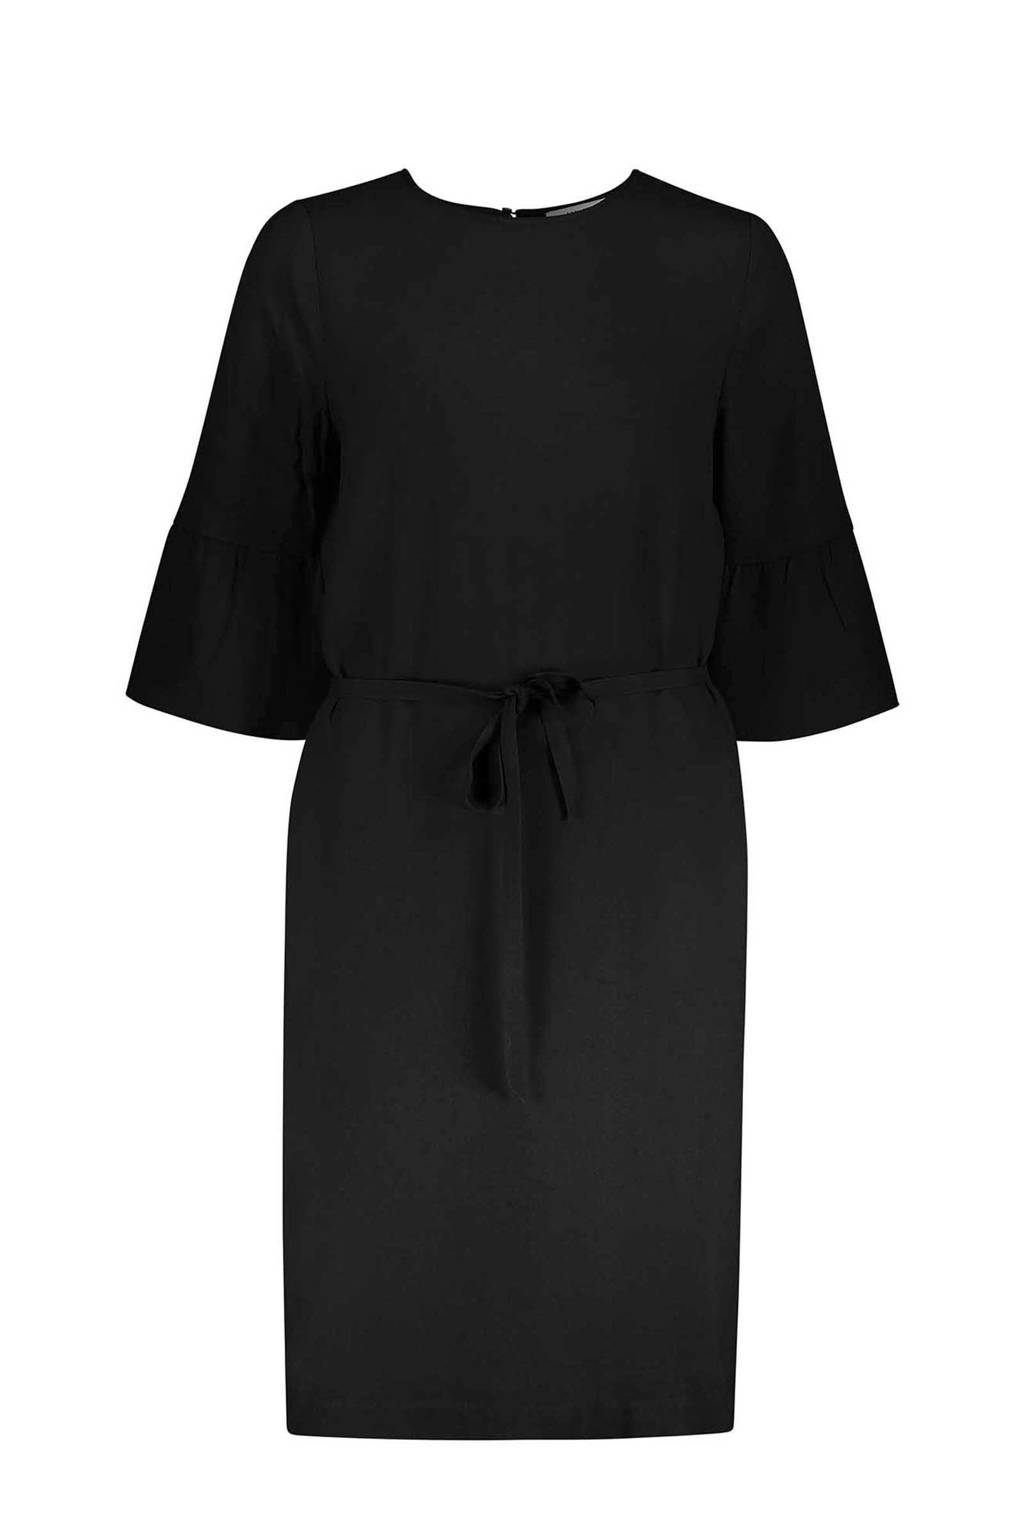 Sissy-Boy jurk zwart, Zwart